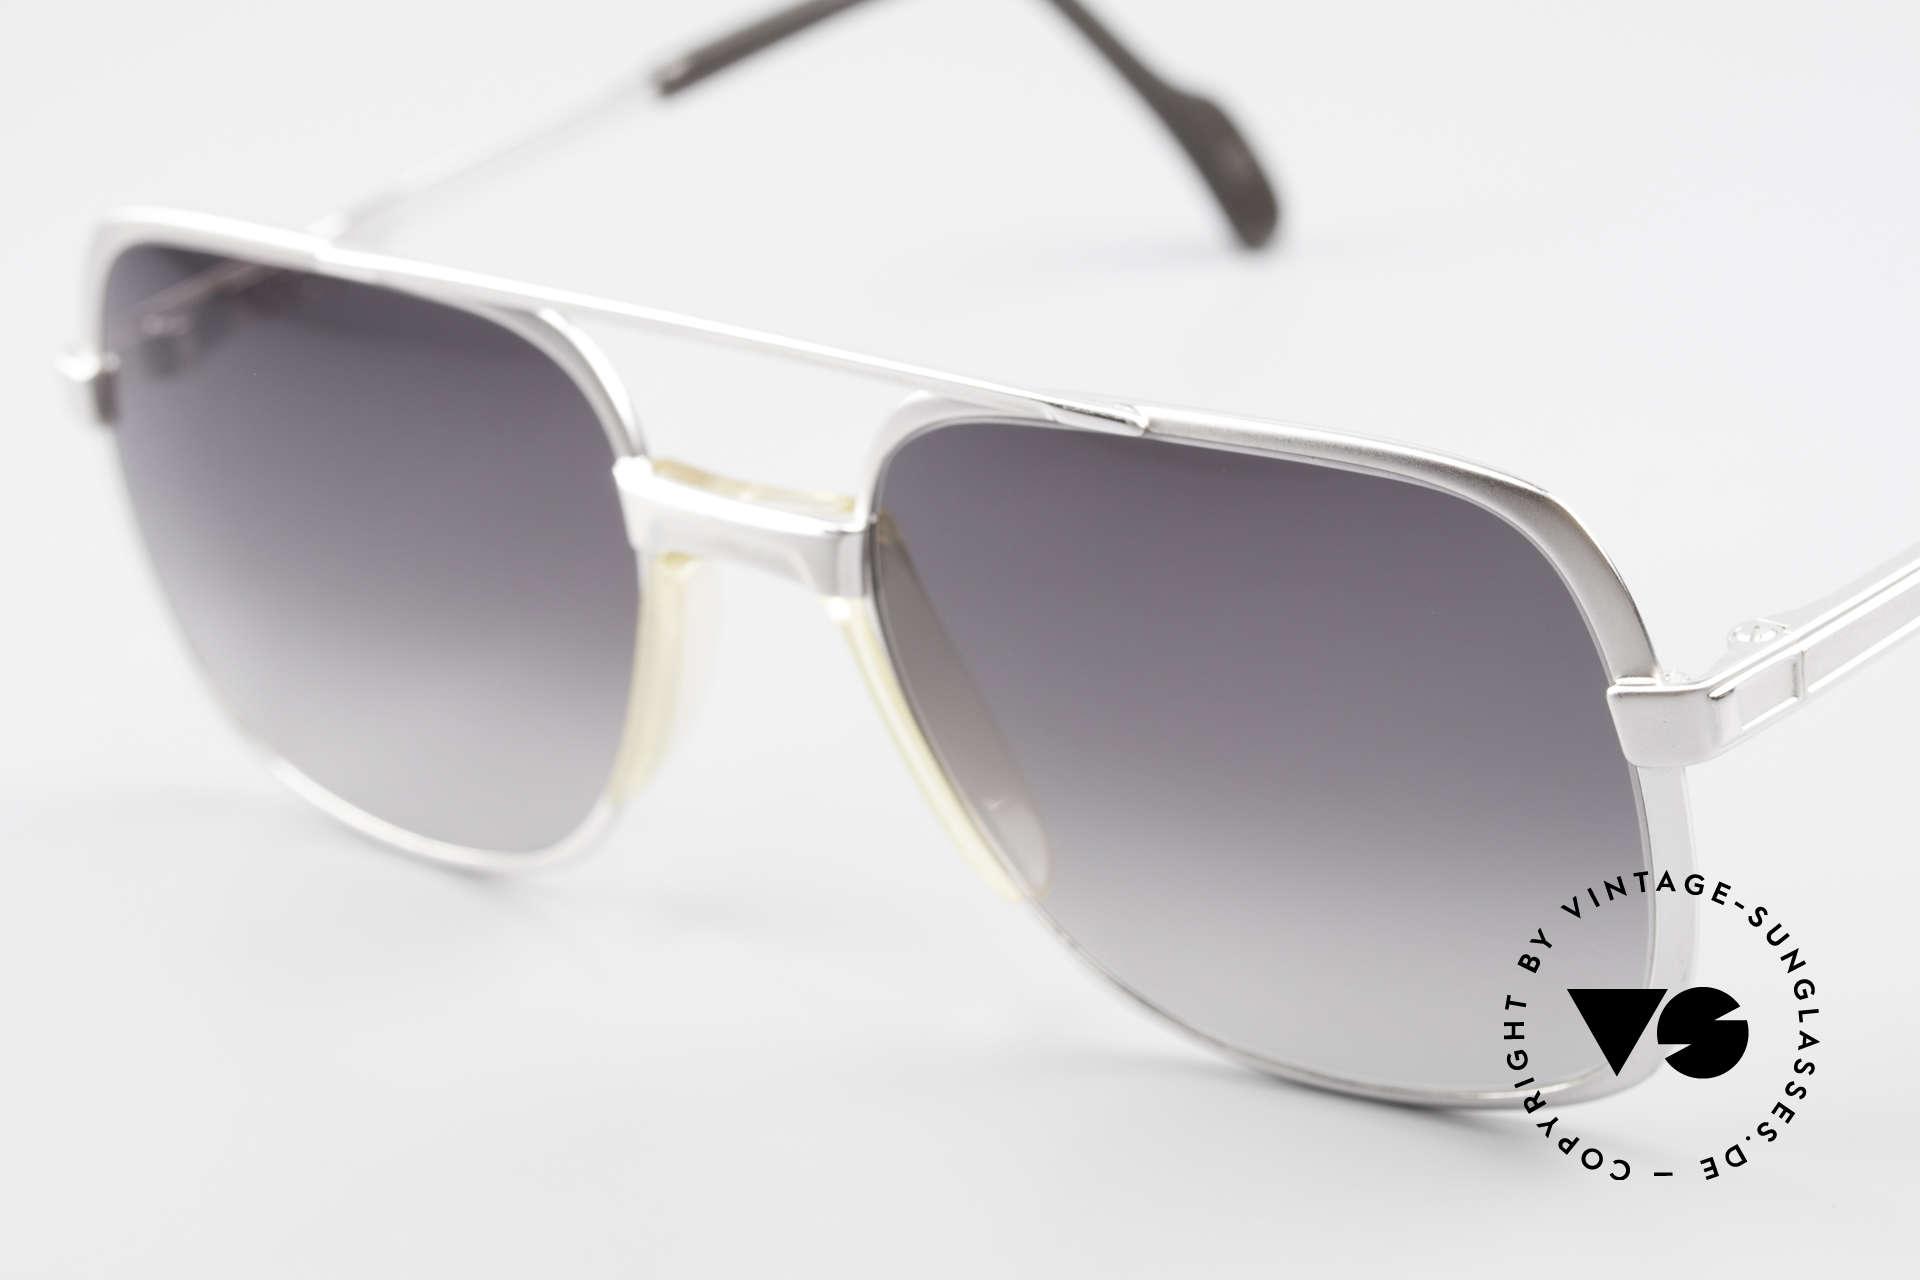 Metzler 0766 1980's Old School Sunglasses, unworn with flexible spring hinges in L size 56/20, Made for Men